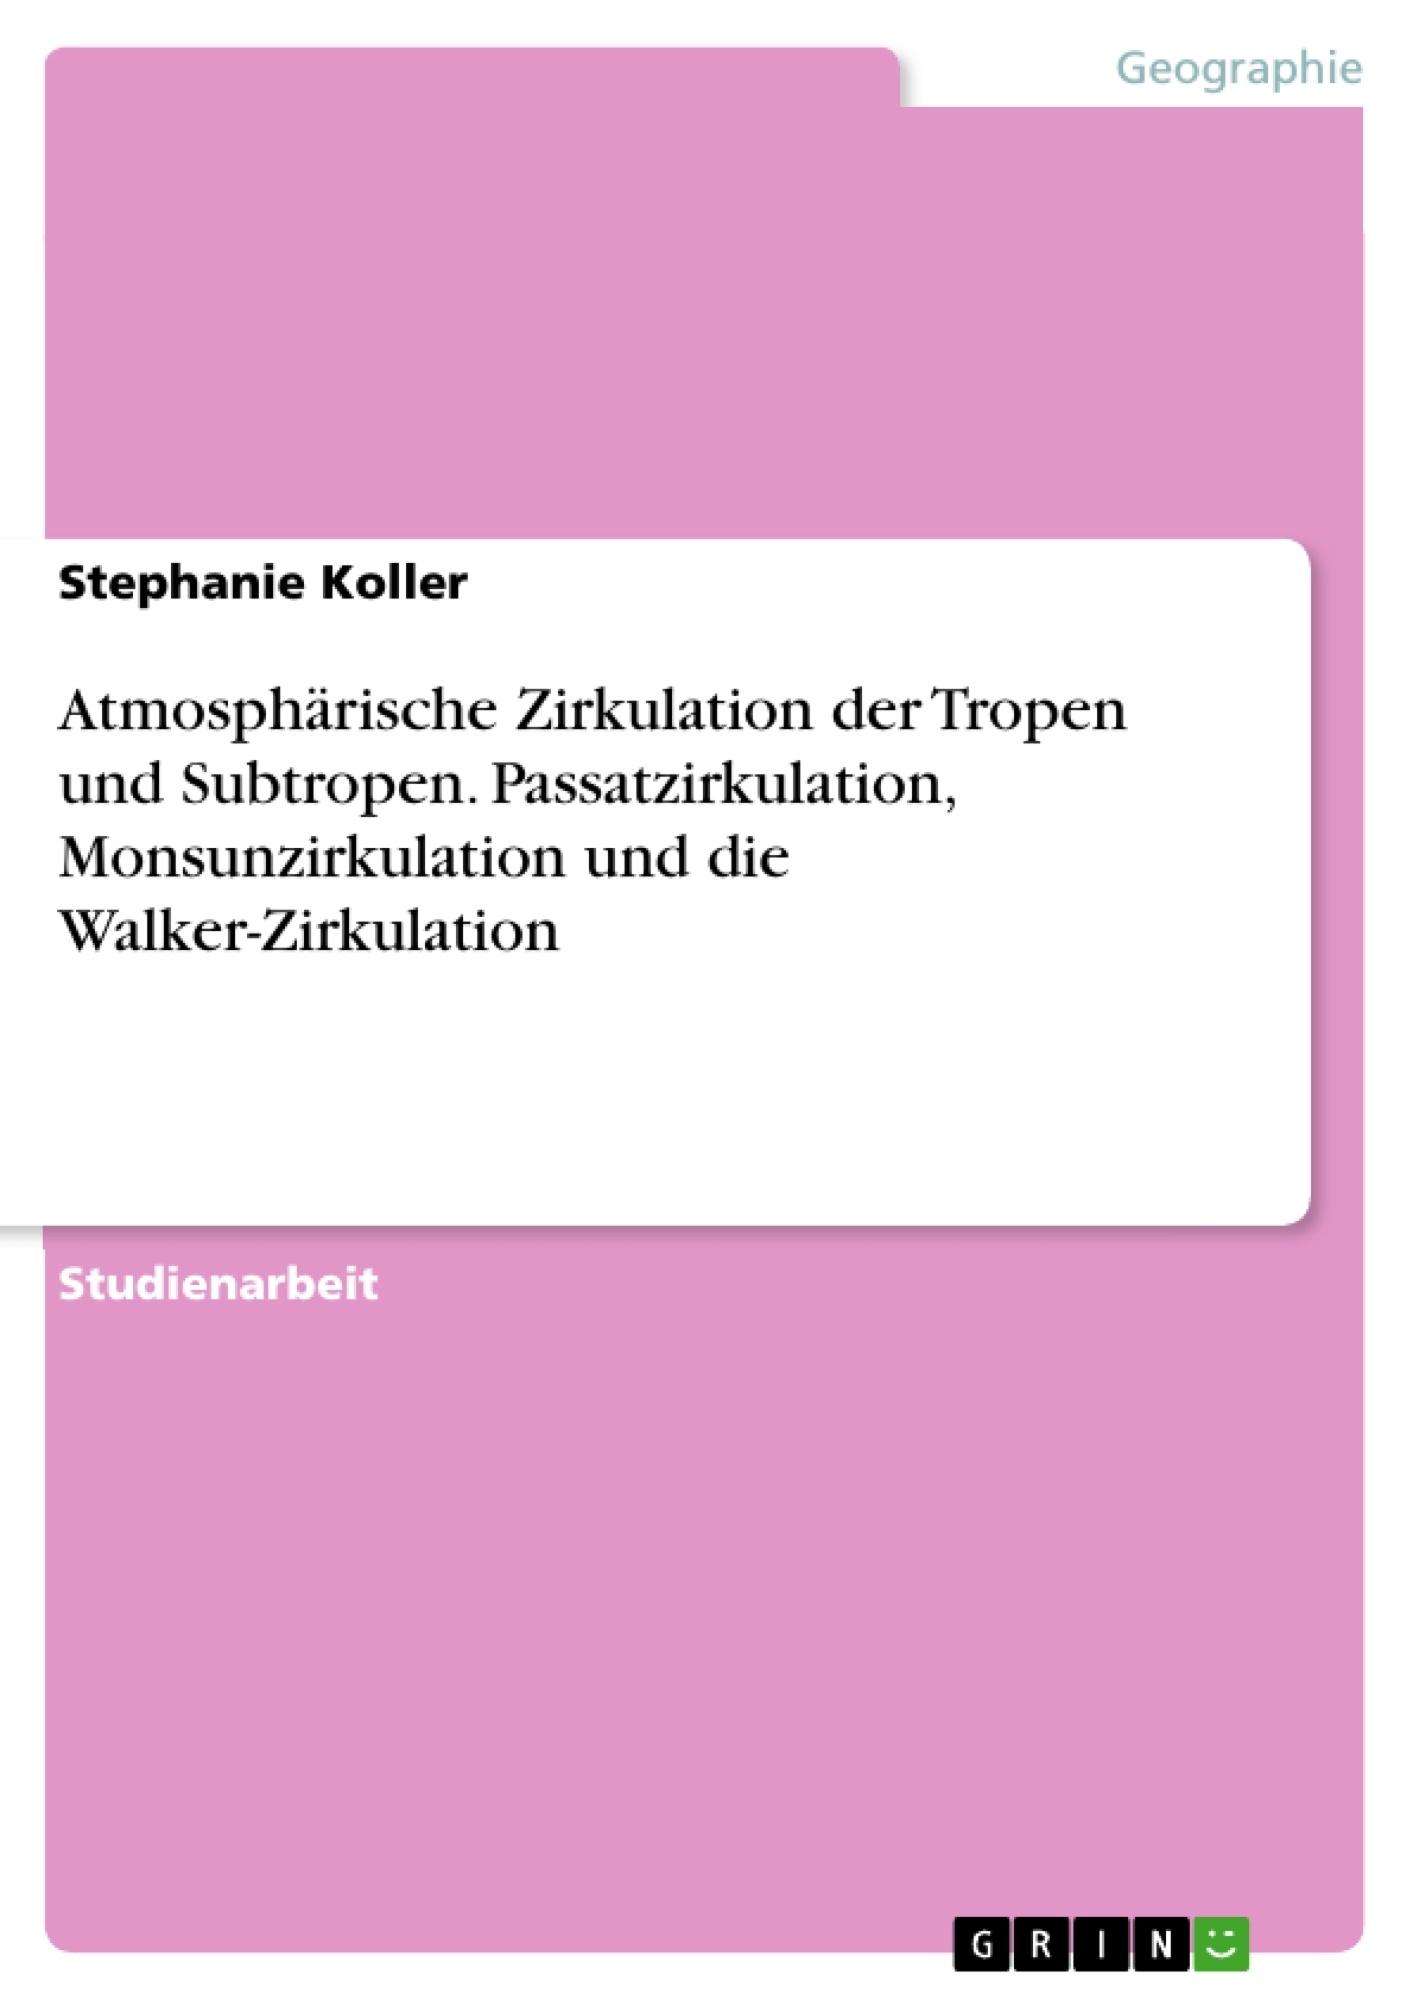 Titel: Atmosphärische Zirkulation der Tropen und Subtropen. Passatzirkulation, Monsunzirkulation und die Walker-Zirkulation